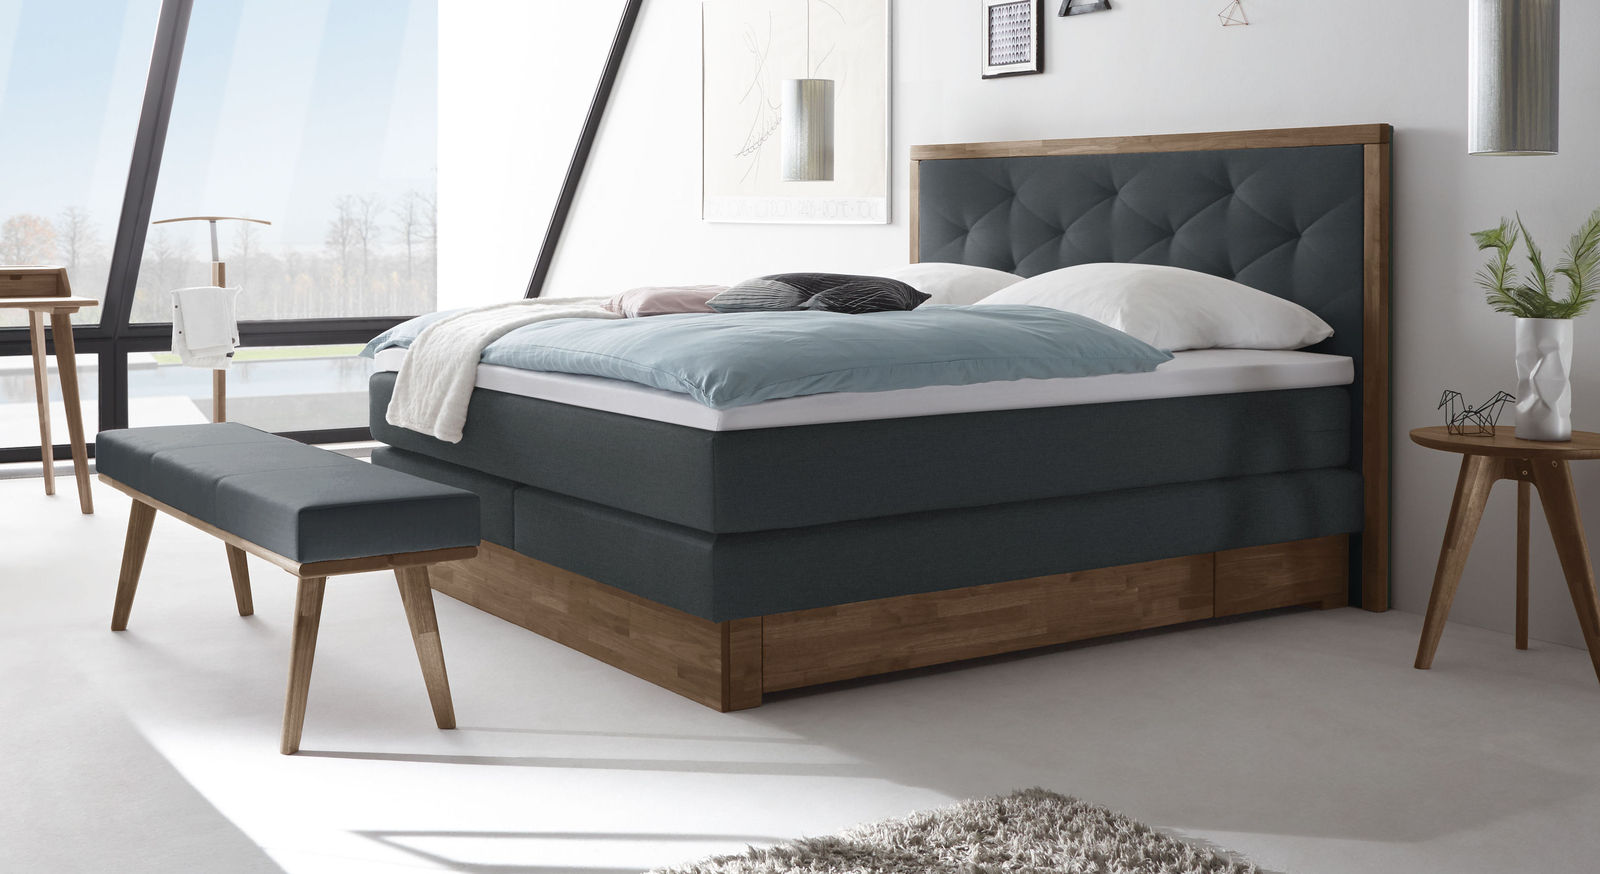 boxspringbett mit schubladen in nussbaum massiv moroni. Black Bedroom Furniture Sets. Home Design Ideas